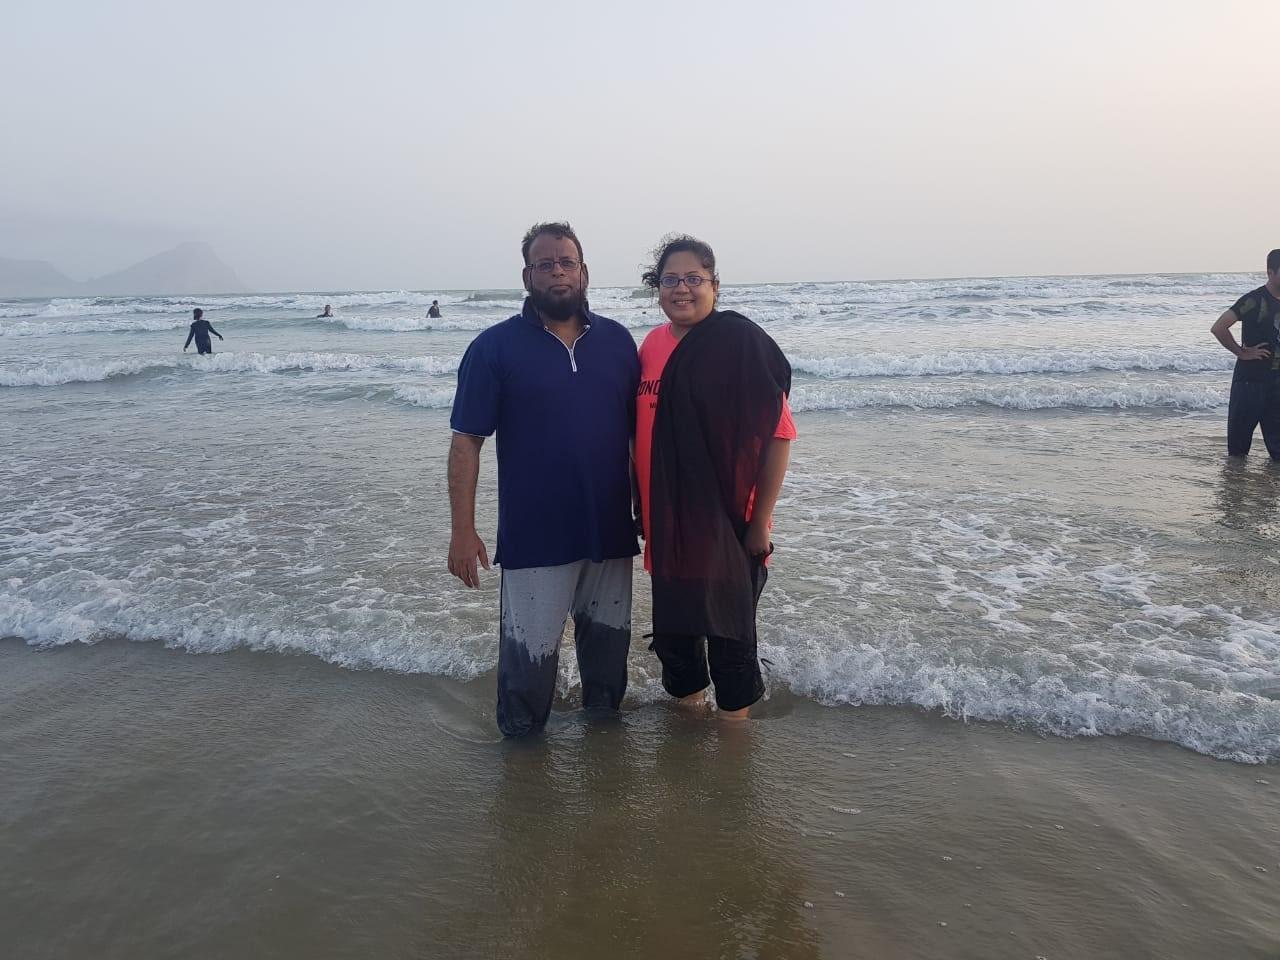 Dr. Ata Ur Rehman and Dr. Kiran Ata Ur Rehman are enjoying the cool water of the Ormara Beach.